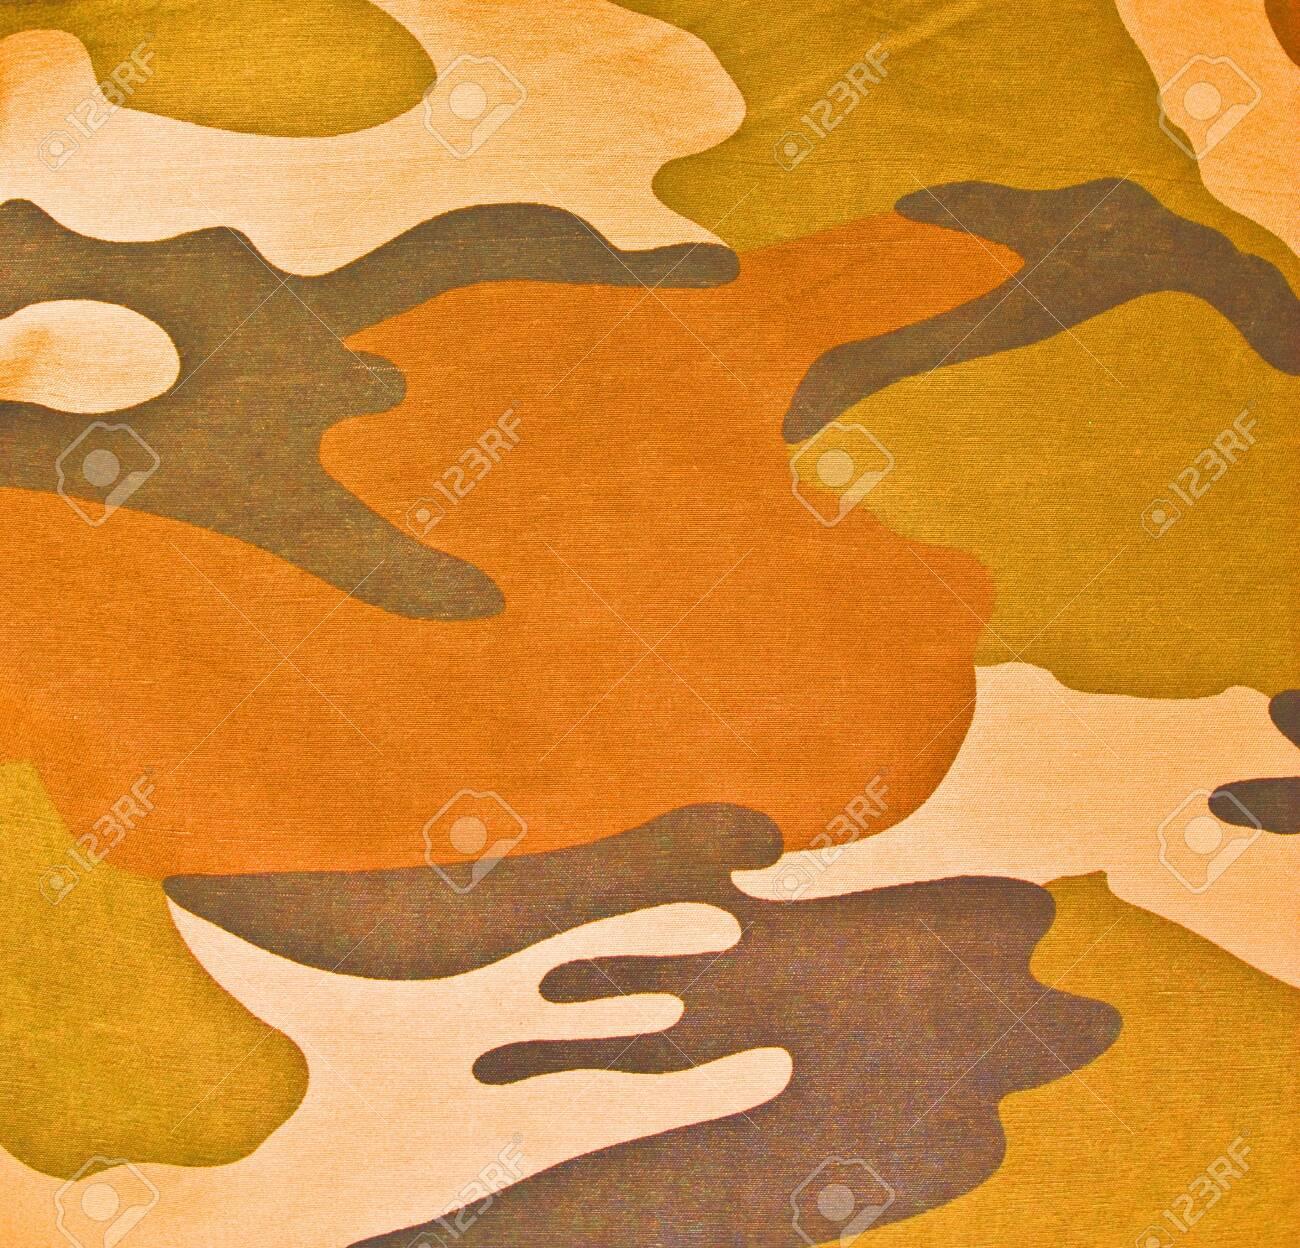 Military texture (brown, black, marsh, green colors) - 147808254